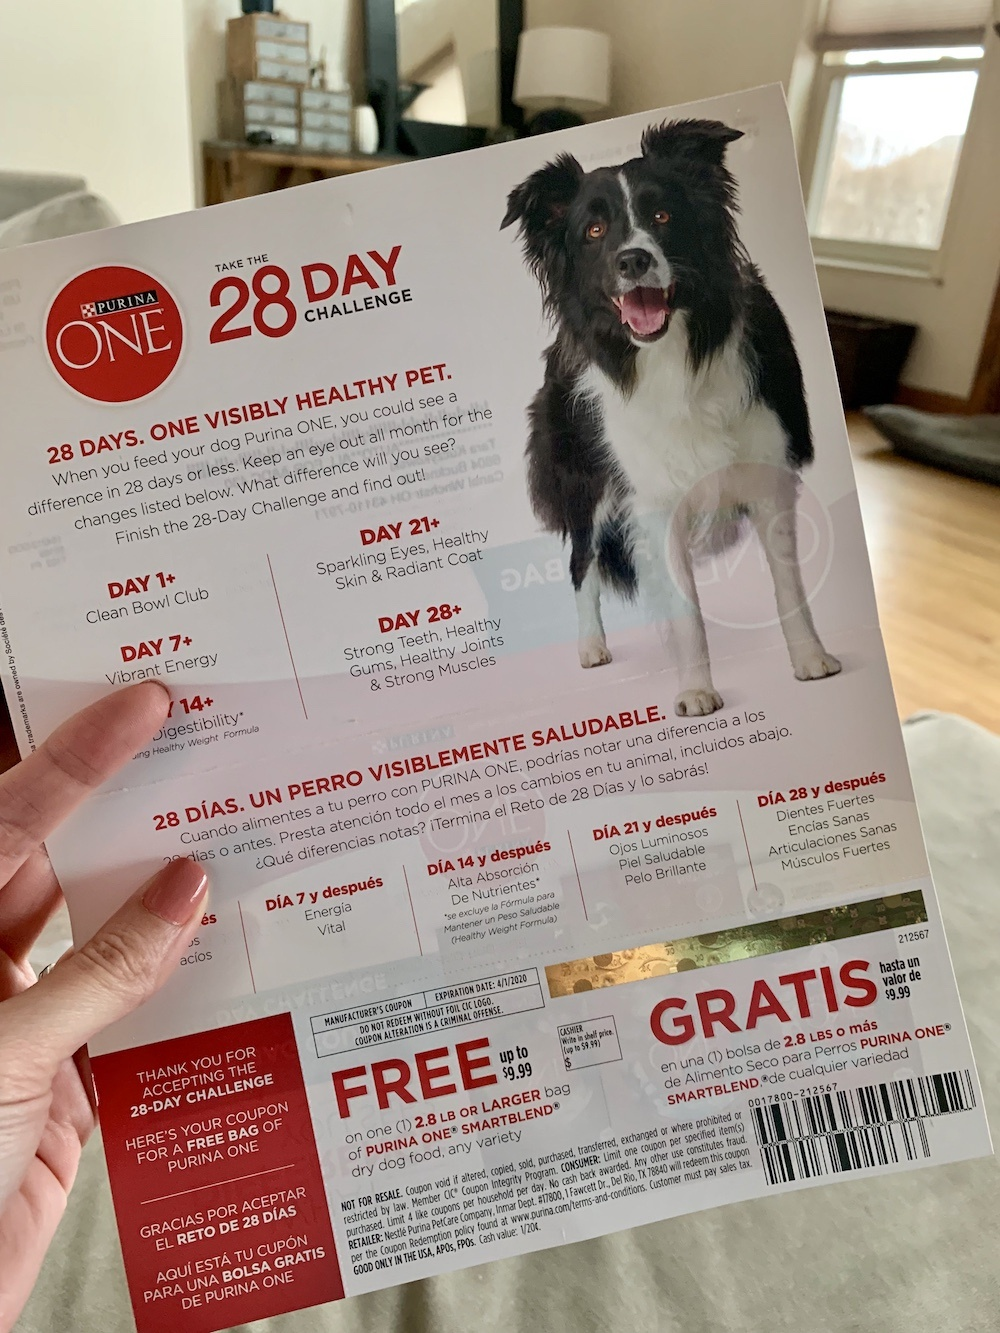 My Free Bag Of Purina One Dog Food Coupon Came Today! - Deal Seeking Mom - Free Printable Dog Food Coupons